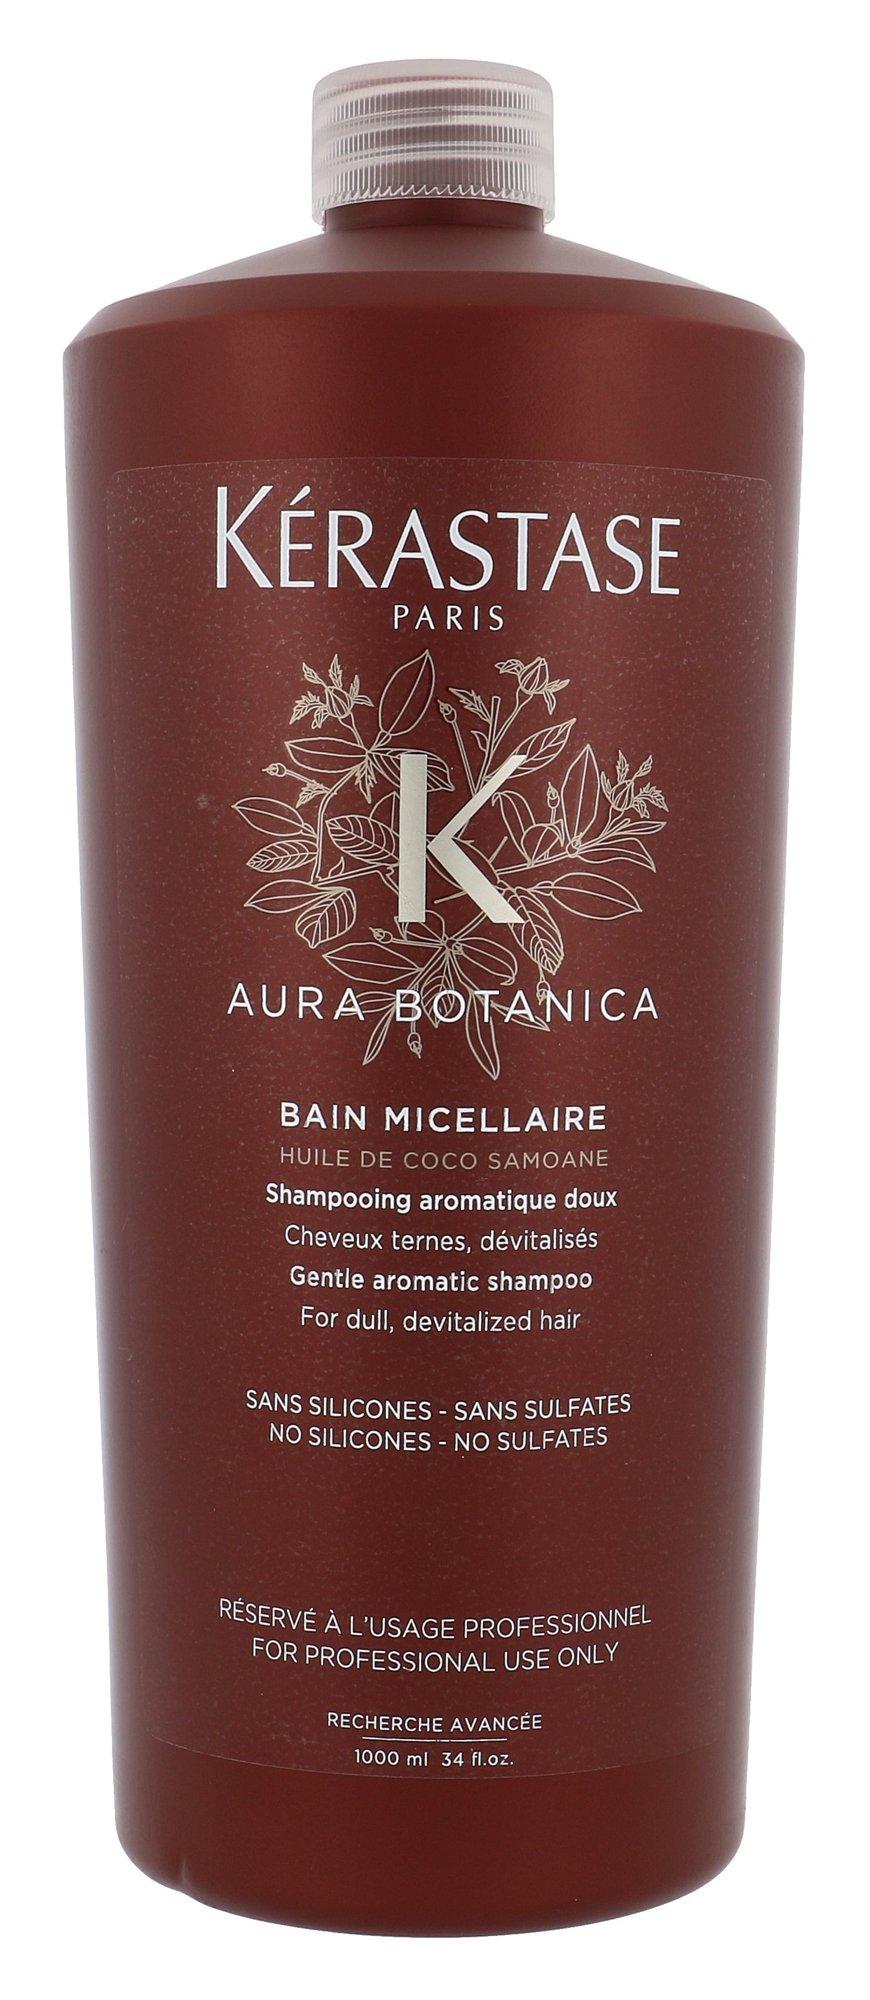 Kérastase Aura Botanica Cosmetic 1000ml